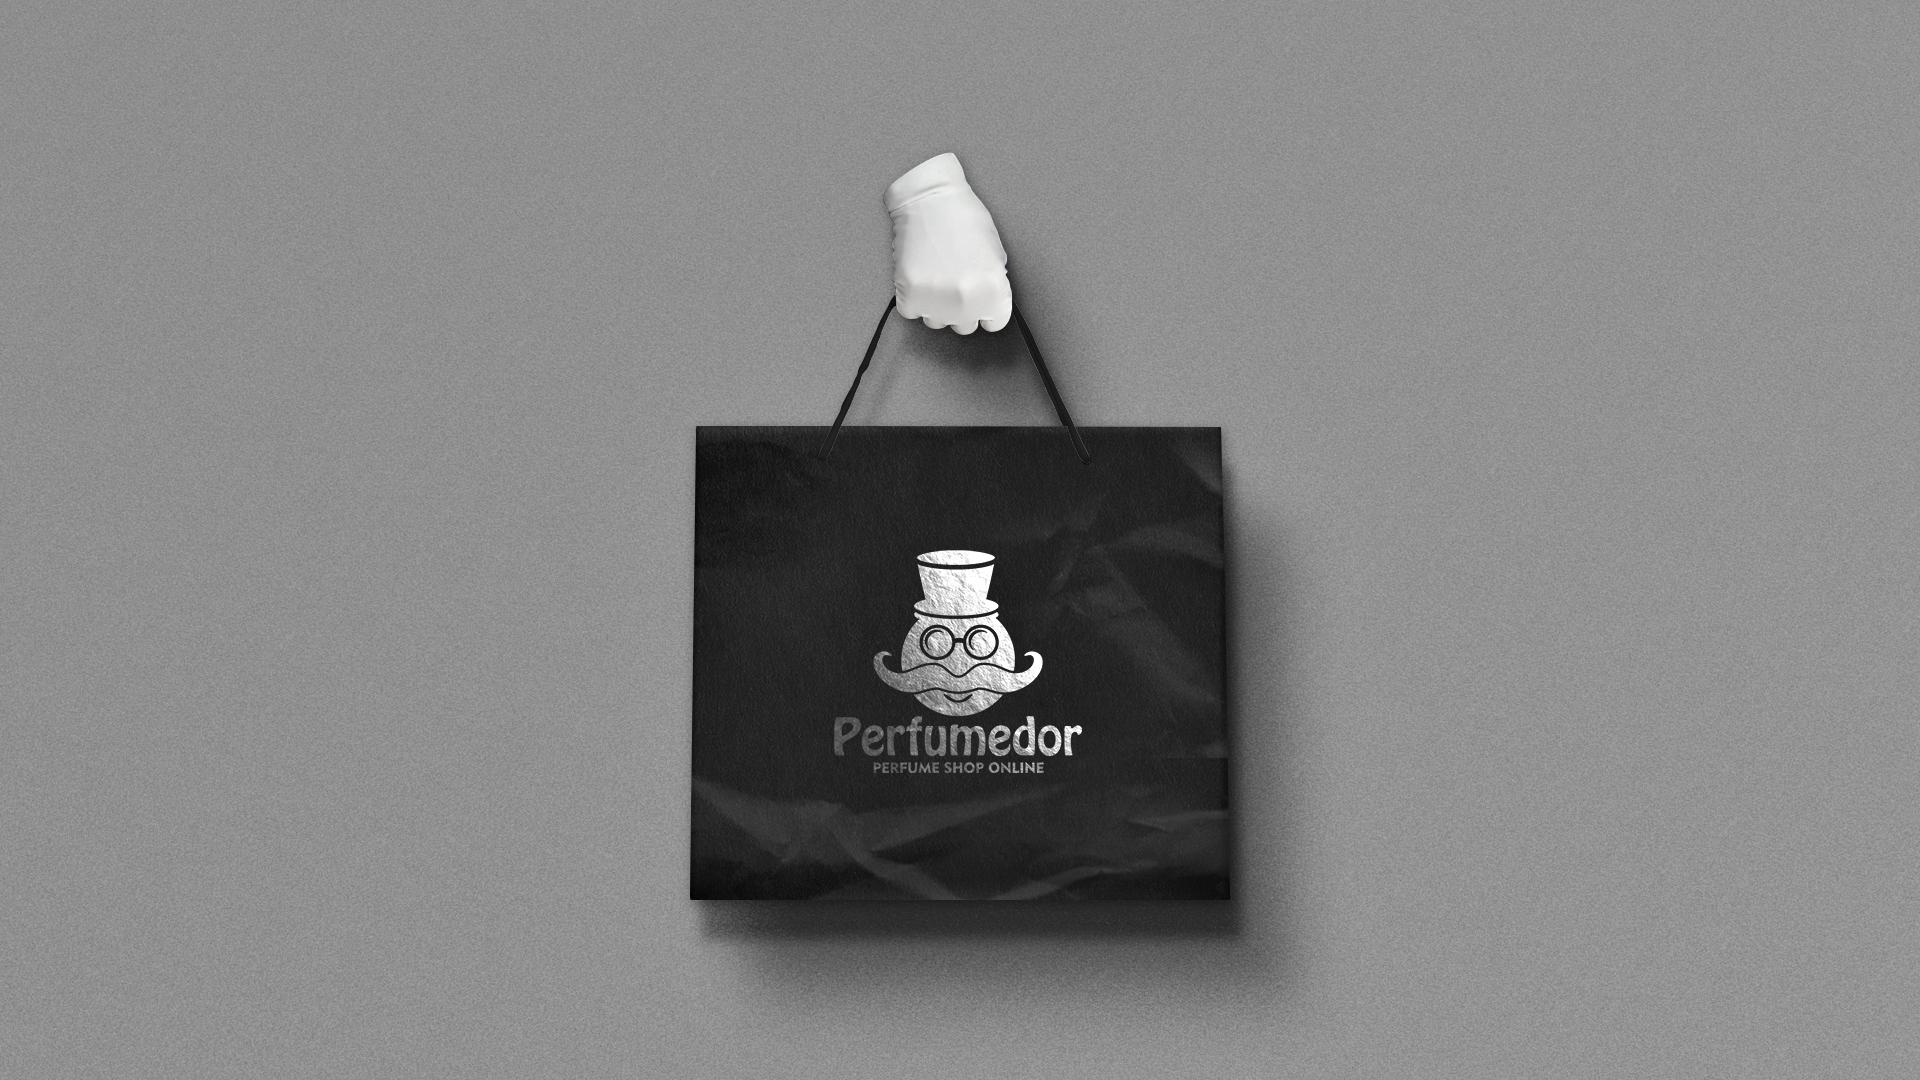 Логотип для интернет-магазина парфюмерии фото f_0345b490b164587b.jpg